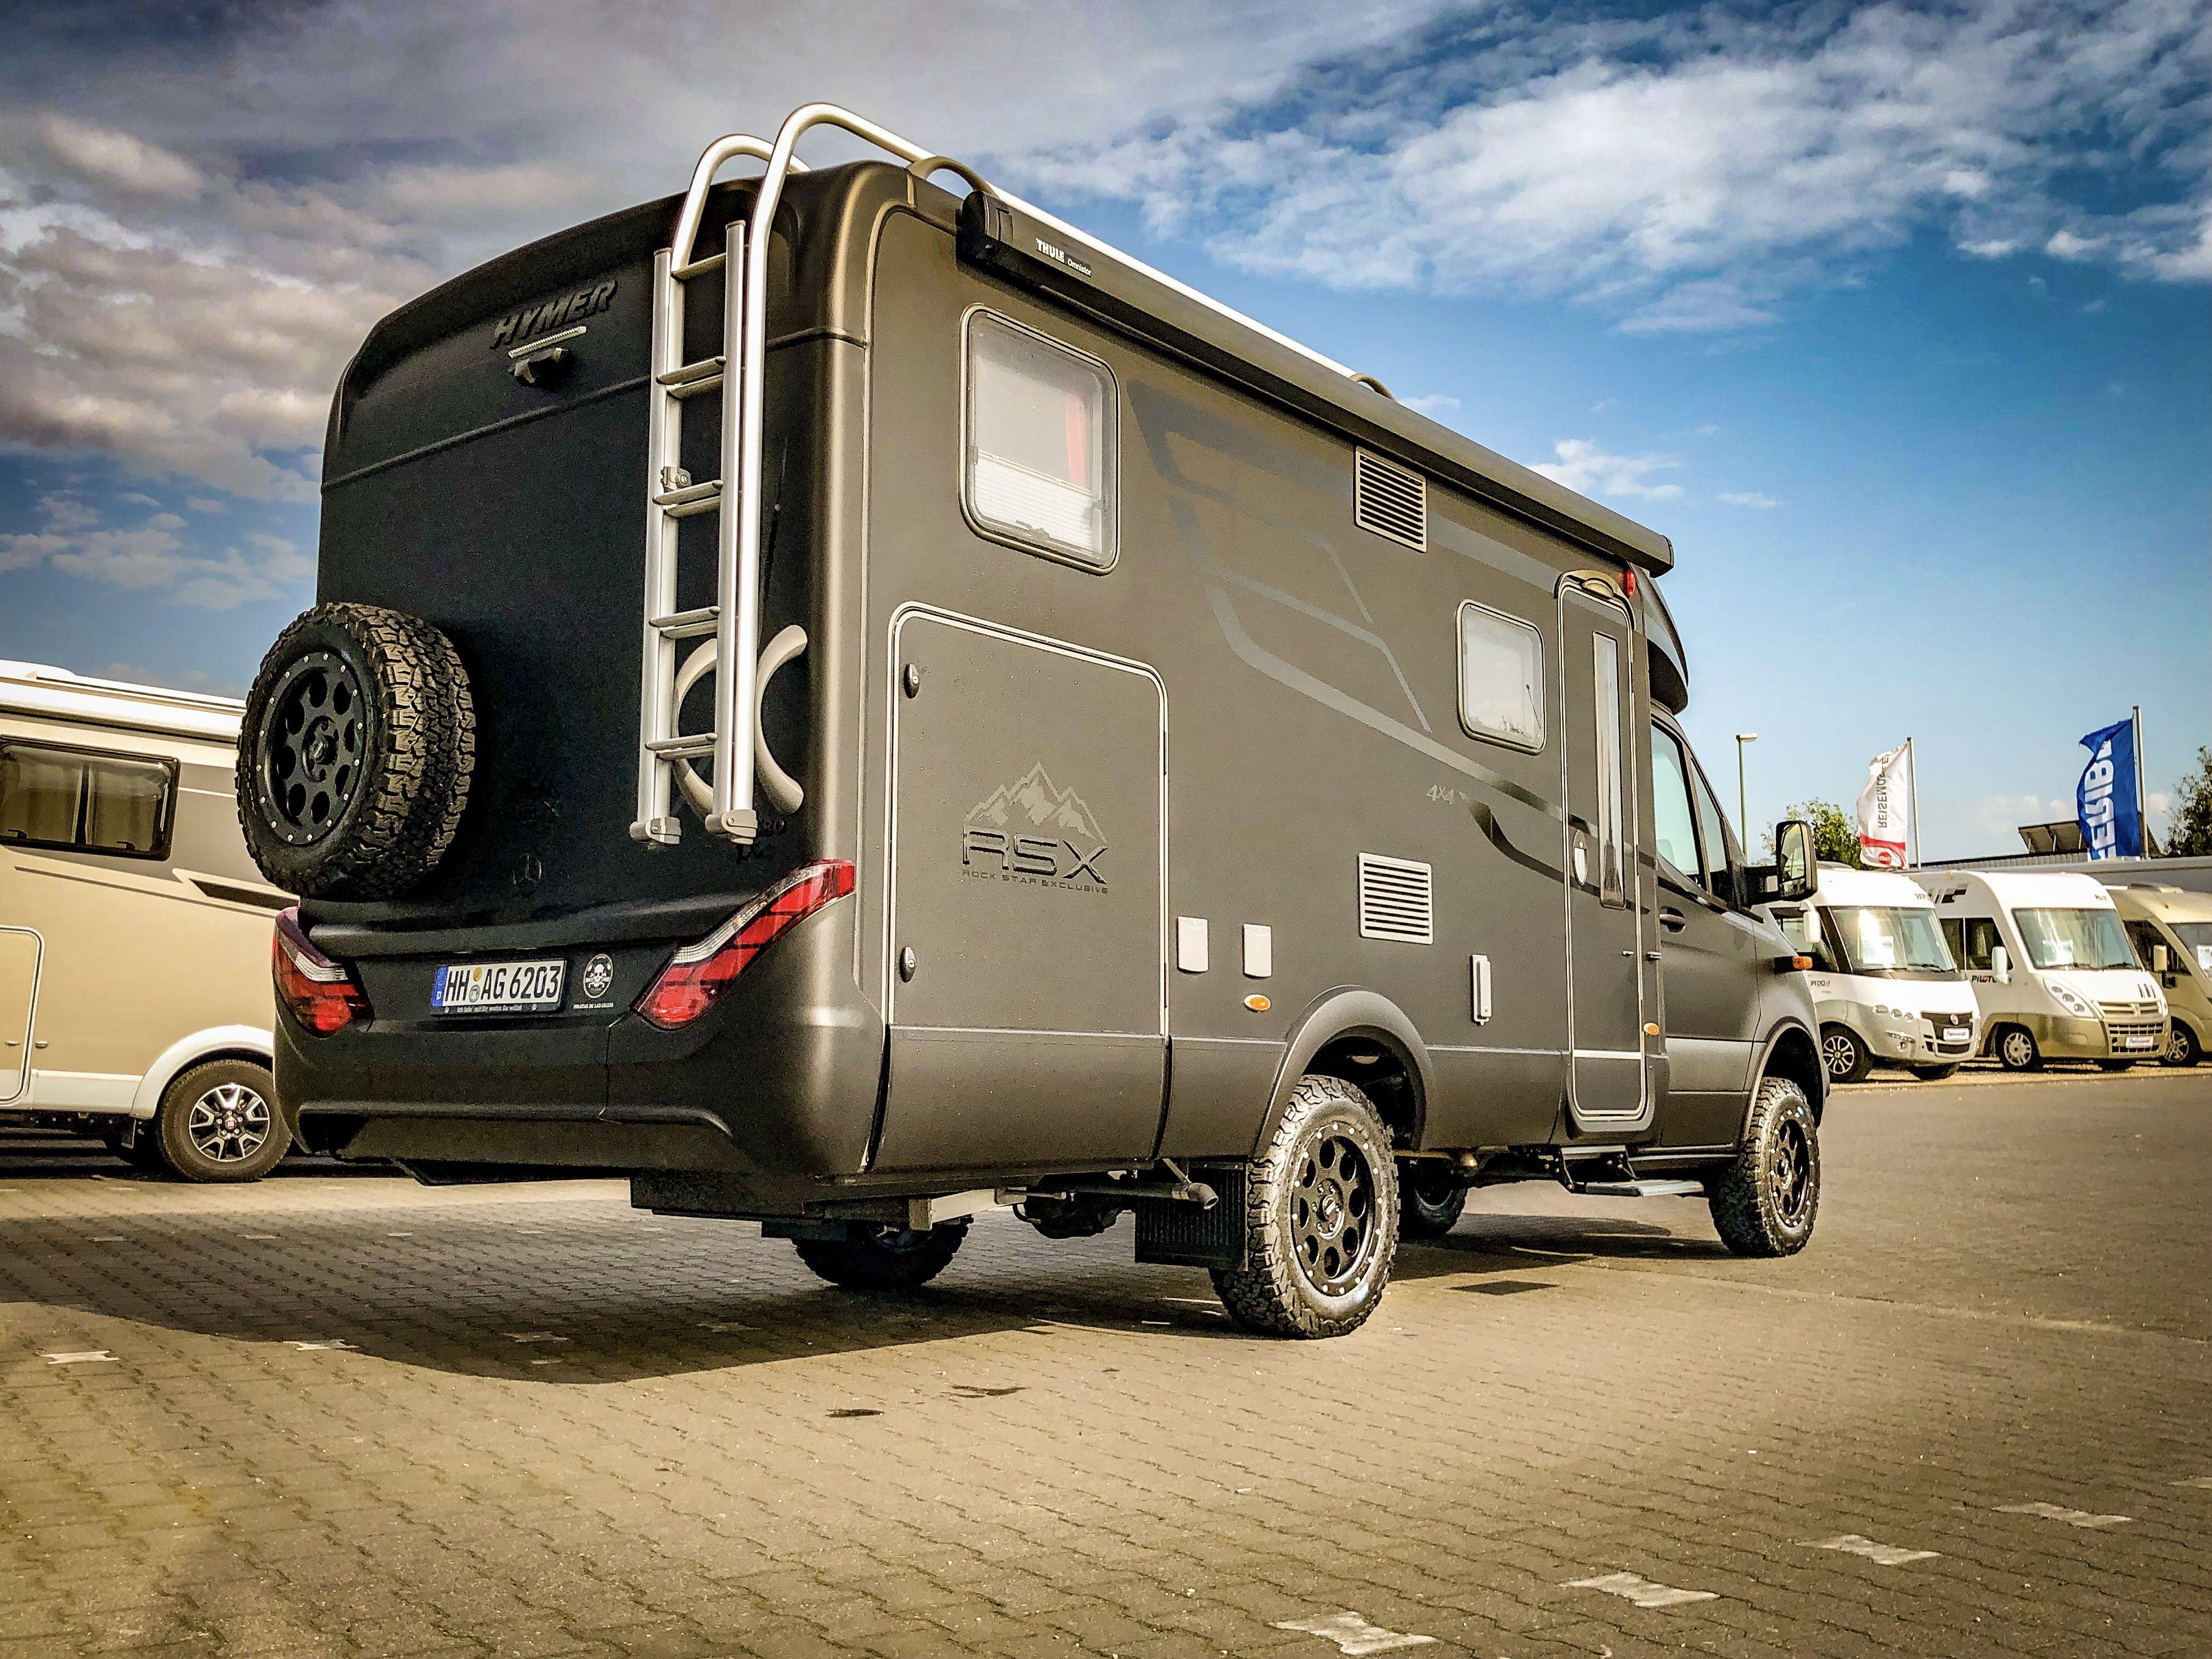 Black back  Reisemobil, Wohnmobil, 10x10 wohnmobil